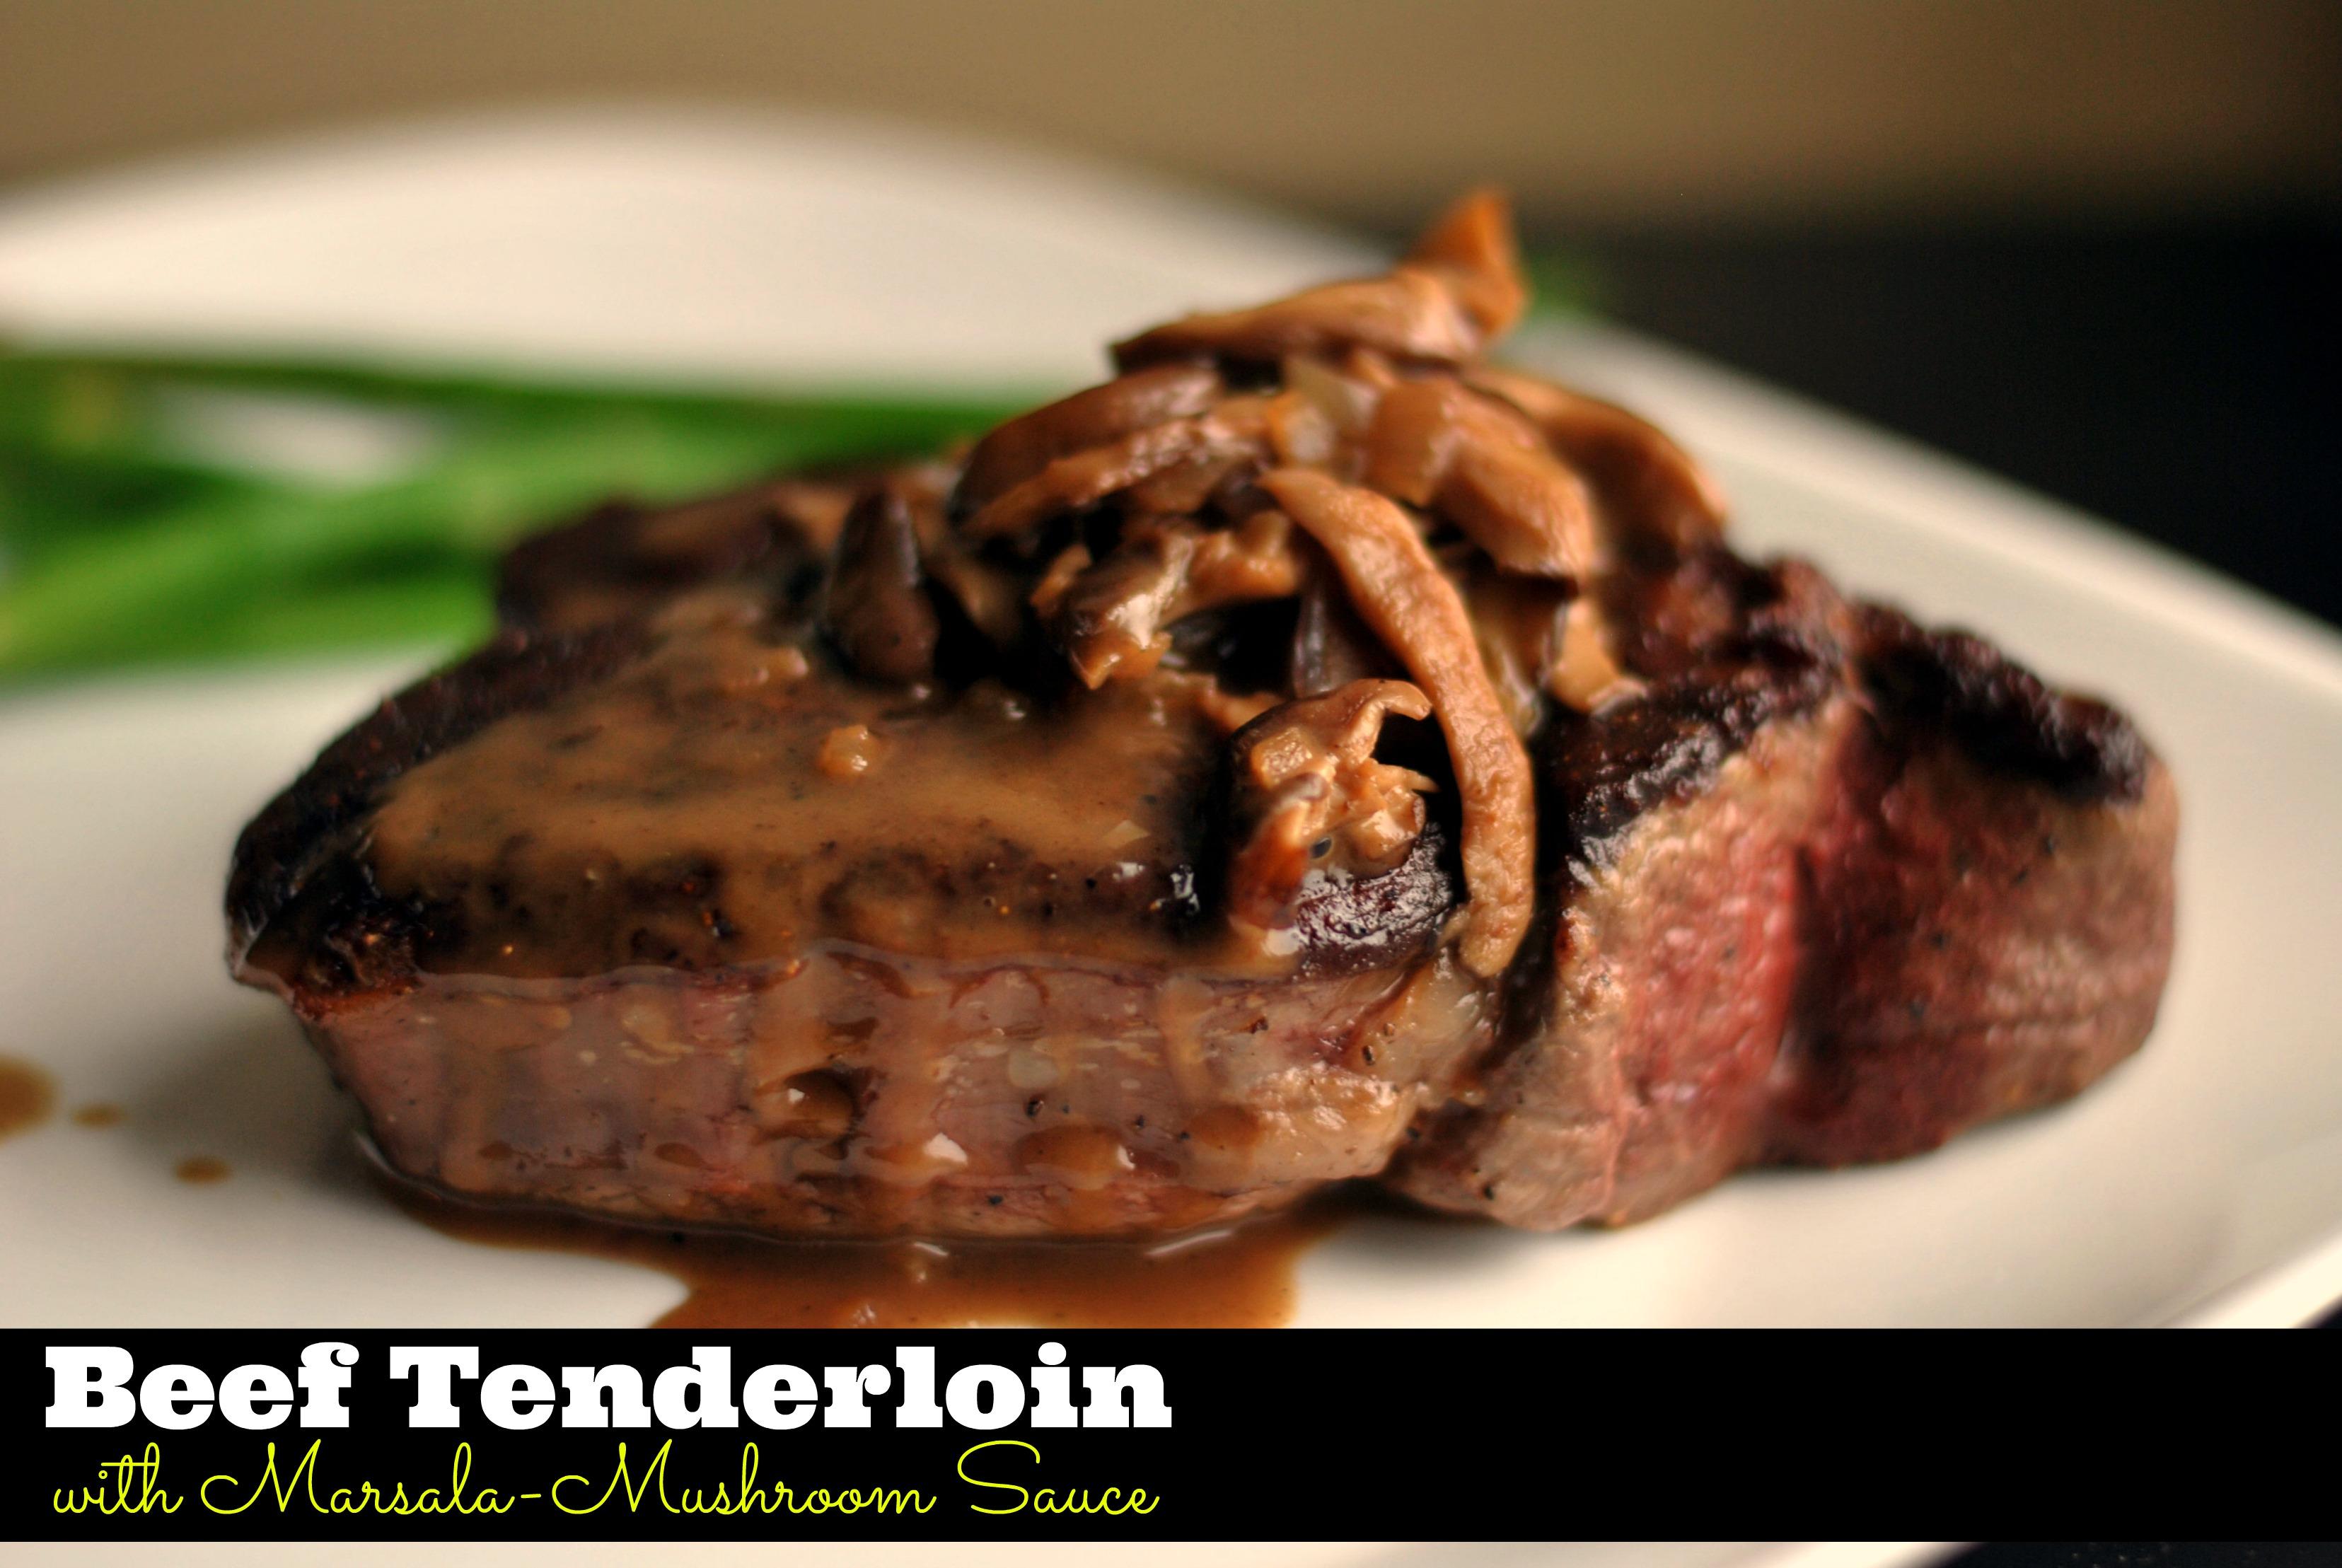 Beef Tenderloin with Marsala-Mushroom Sauce